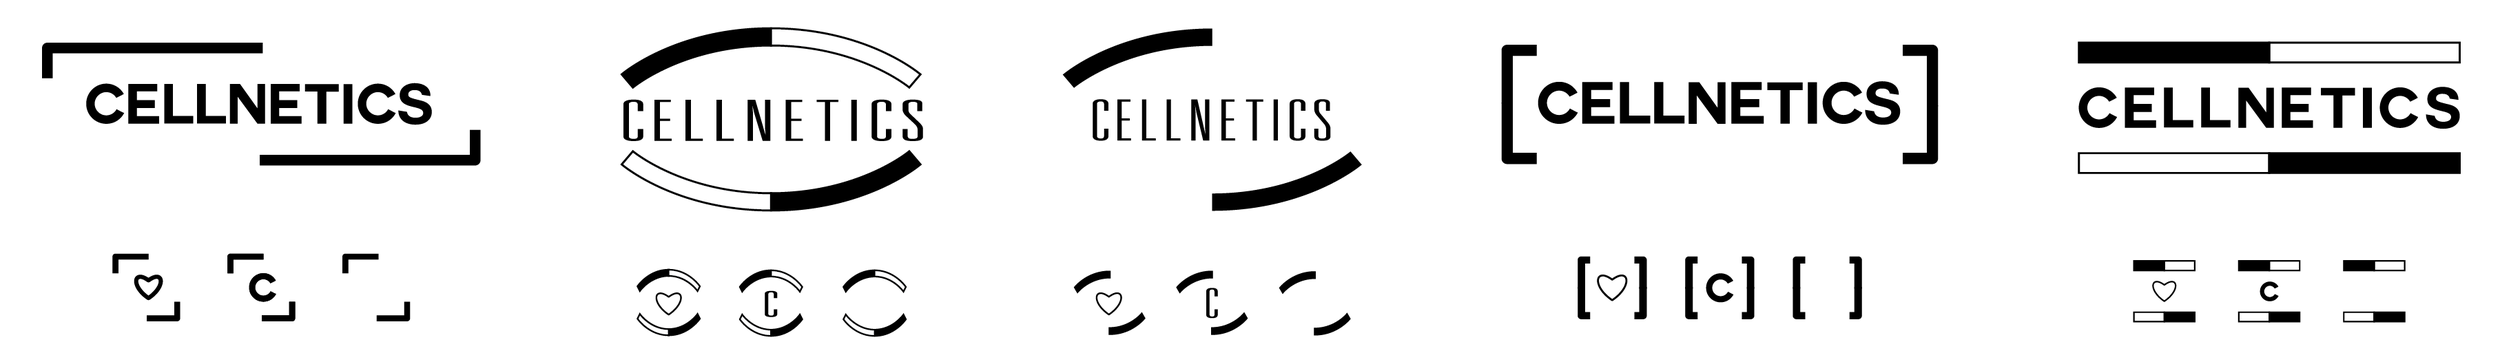 cellnetics web-03.png